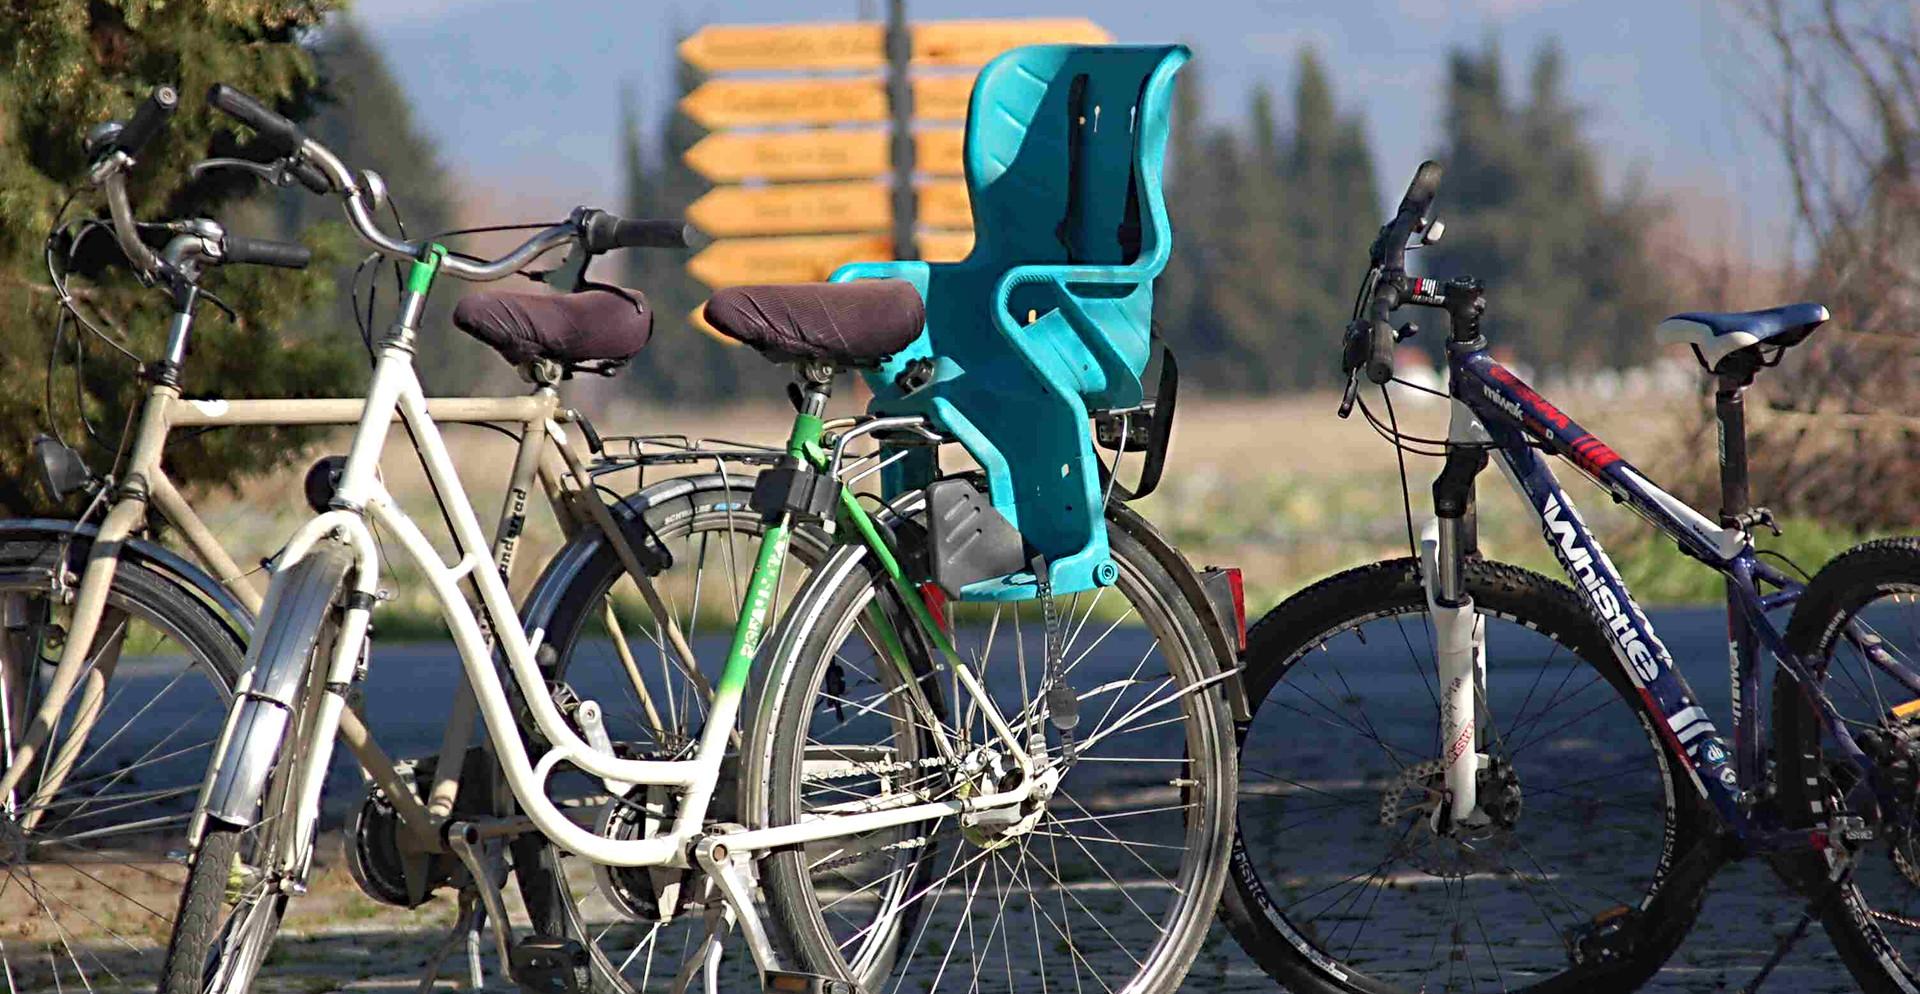 Bikes to rent